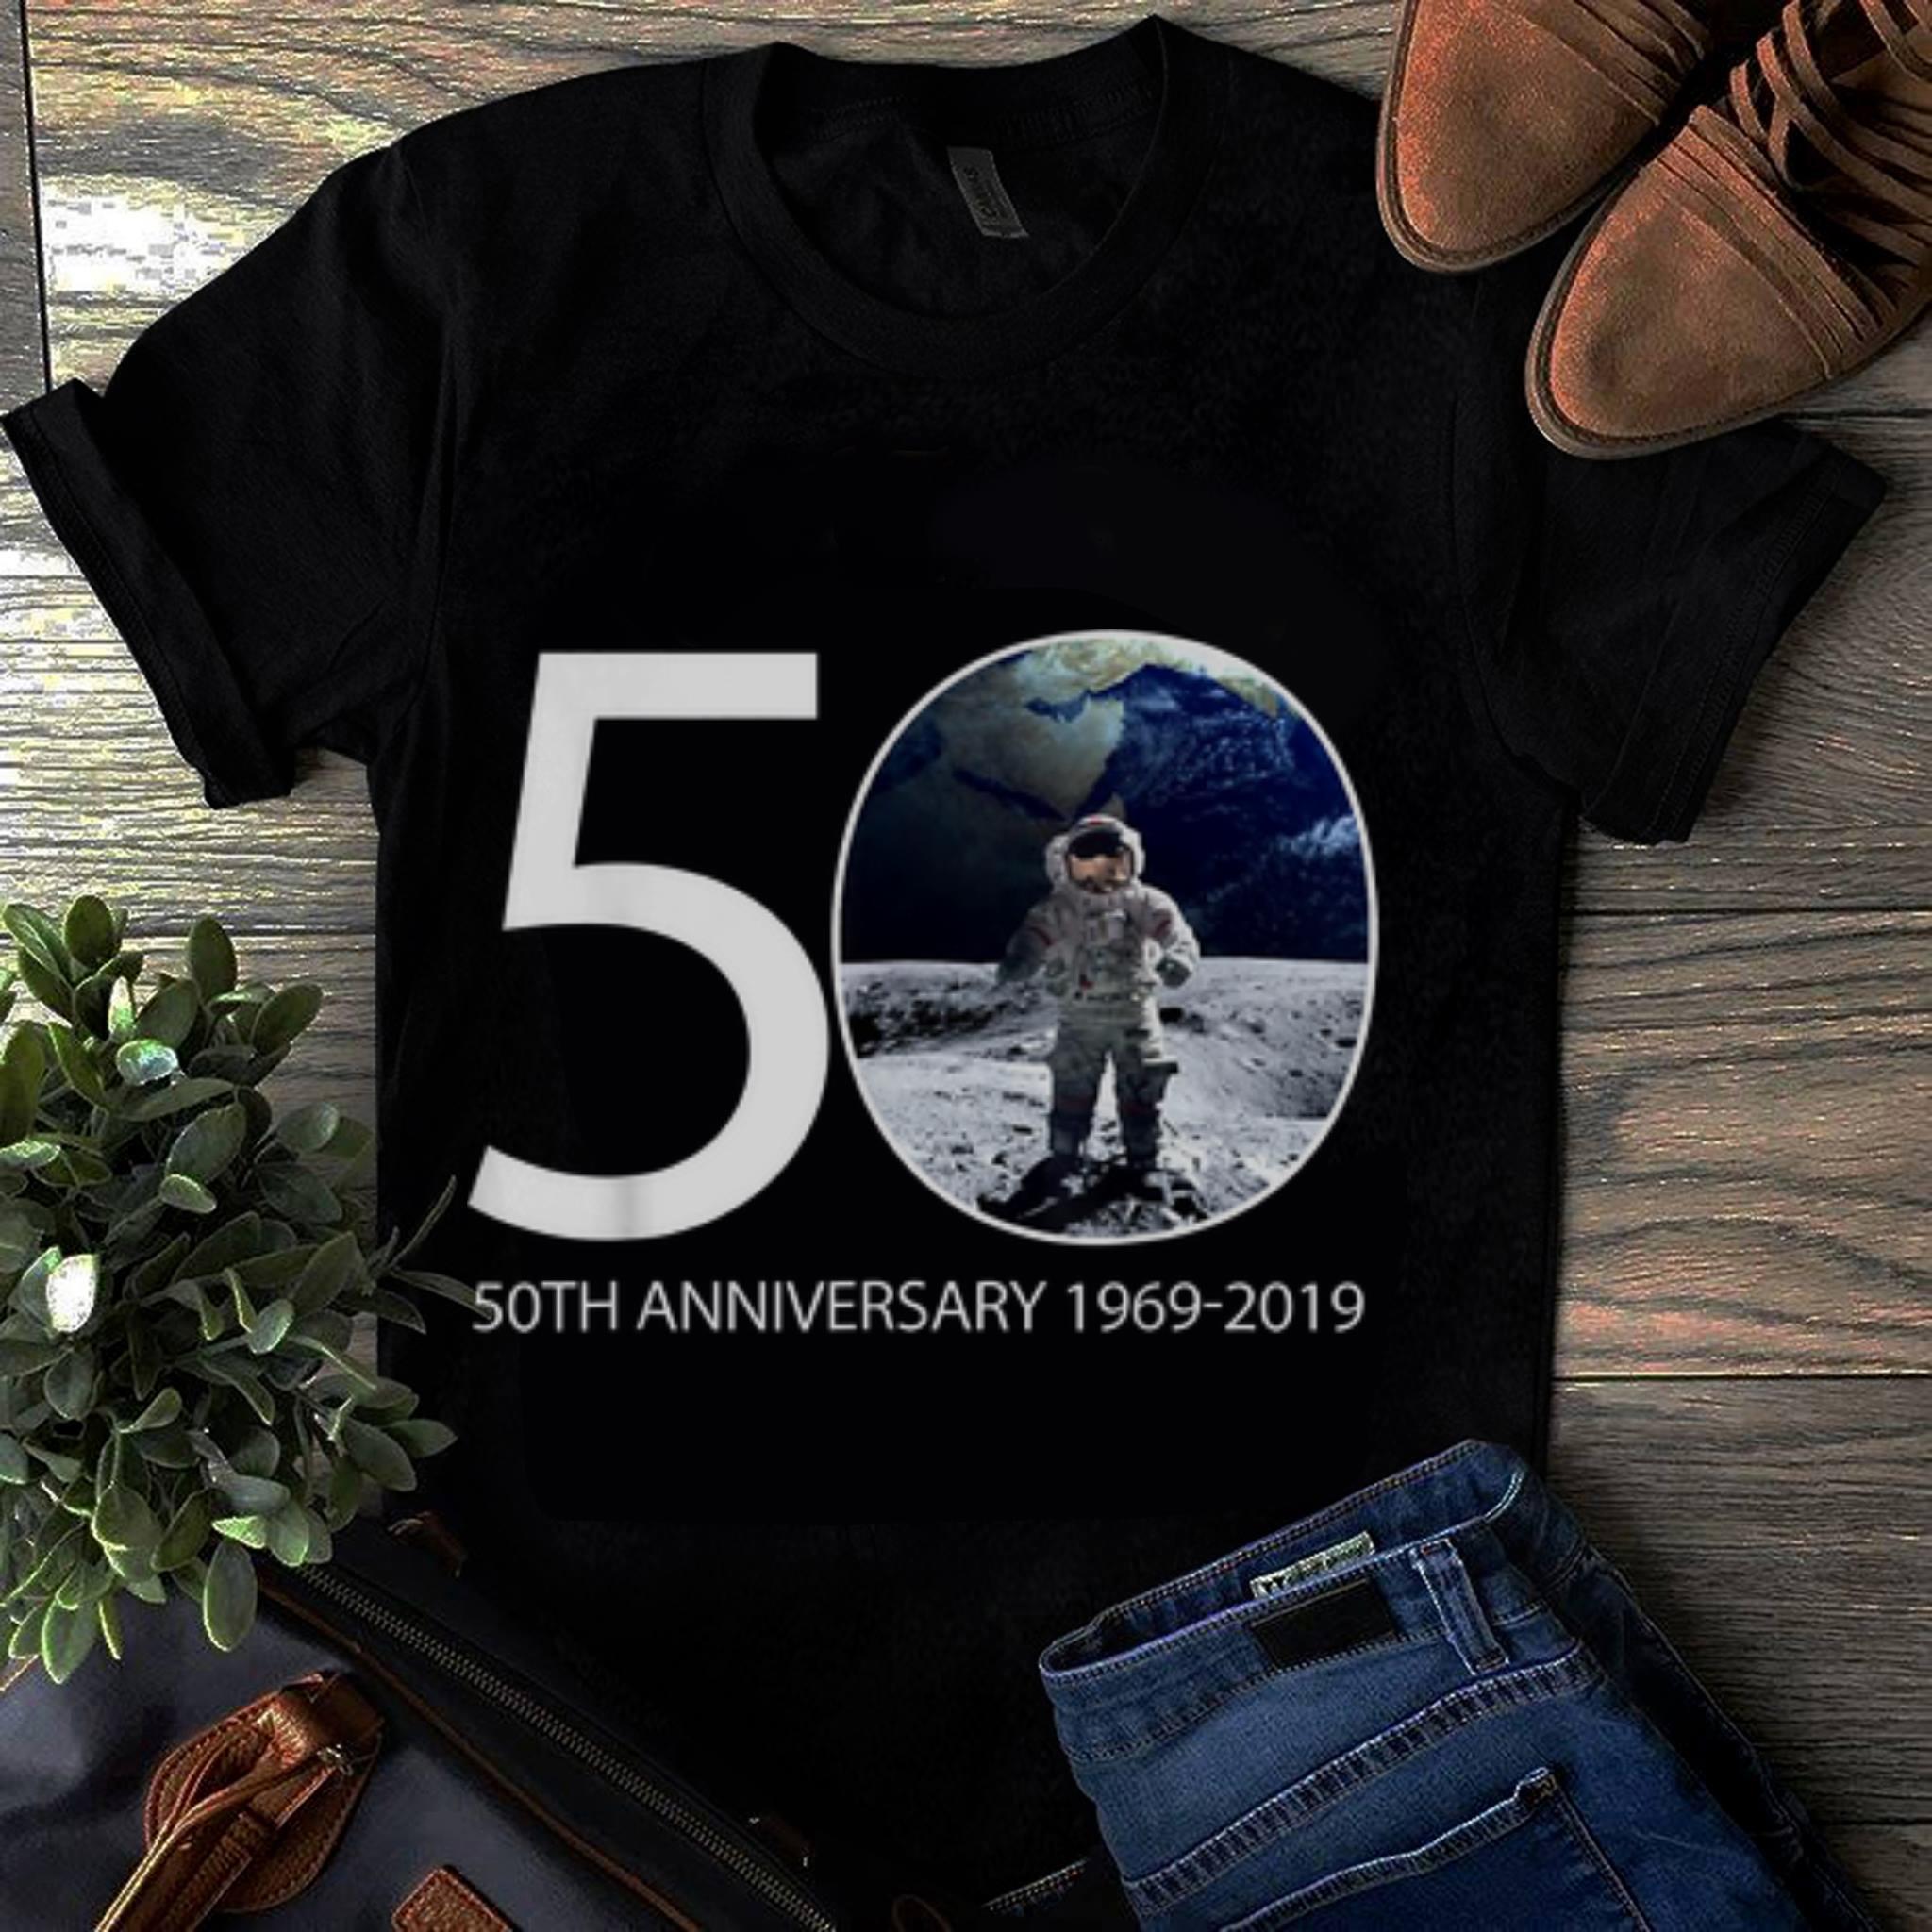 Officical Moon Landing 50th Anniversary Nasa Astronaut 1969-2019 shirt